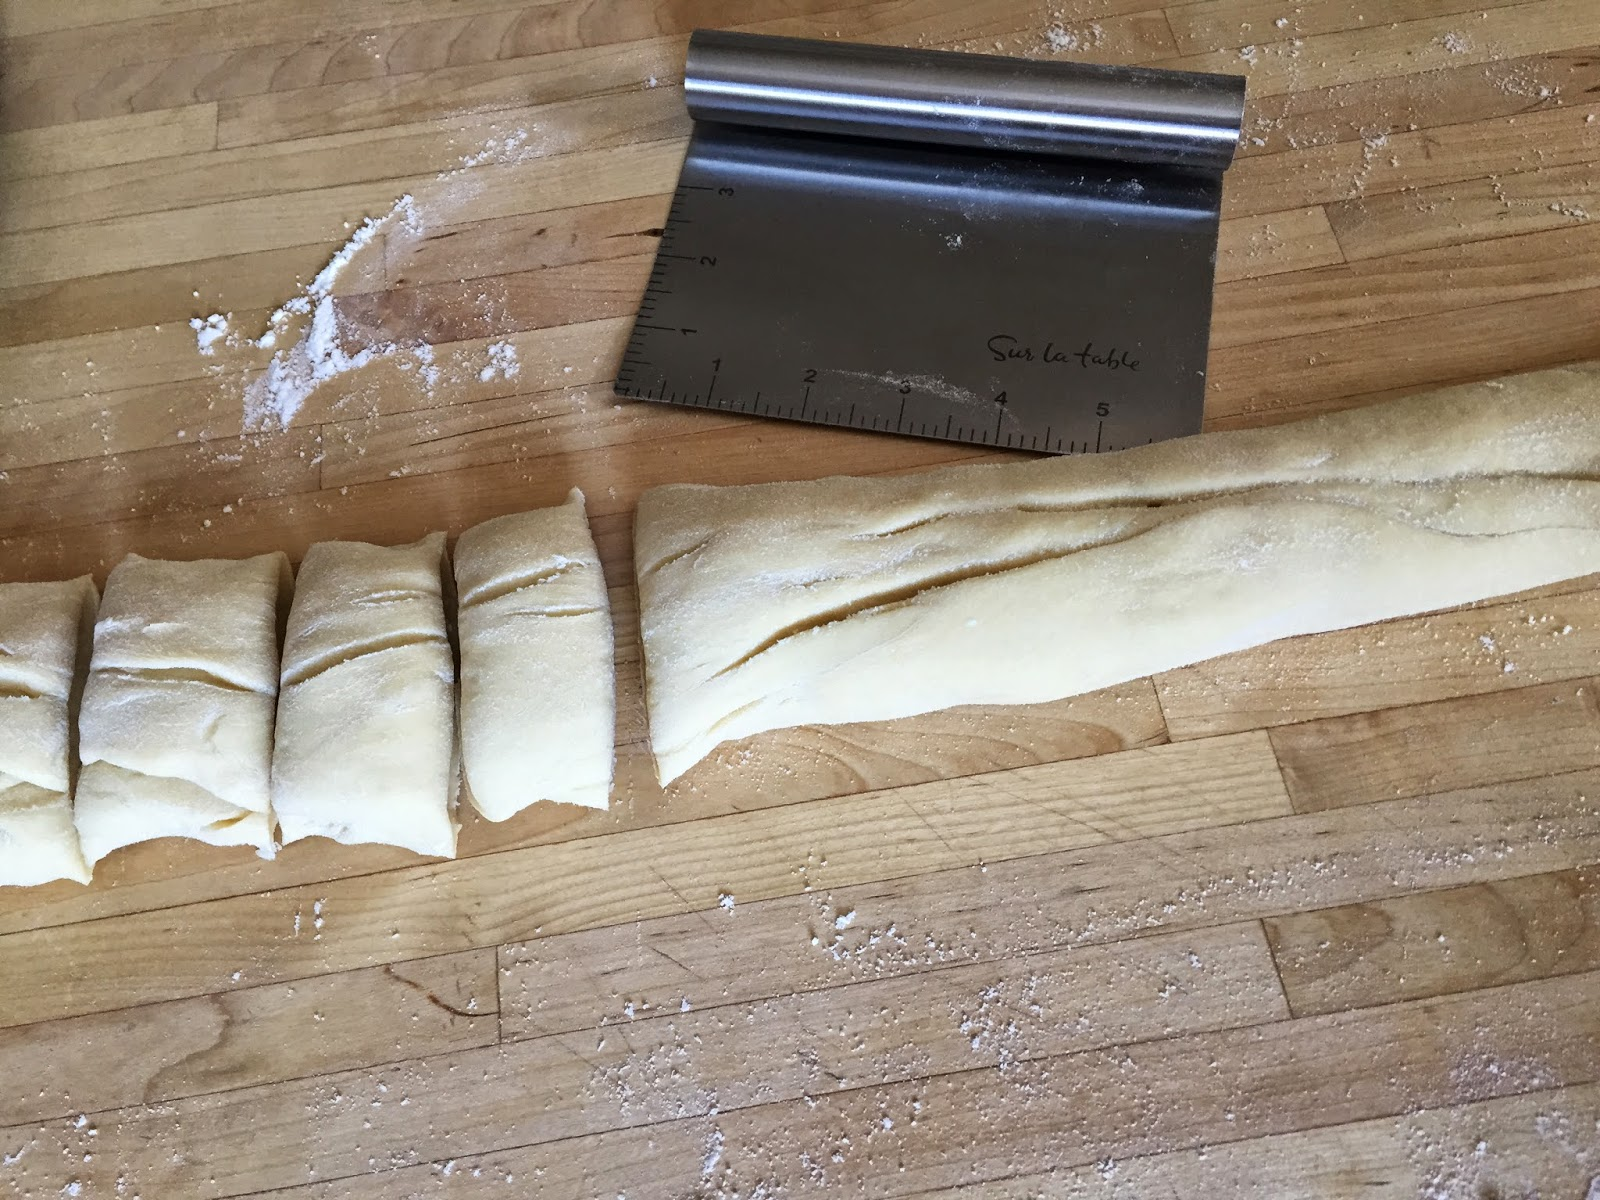 Slice dough into pieces